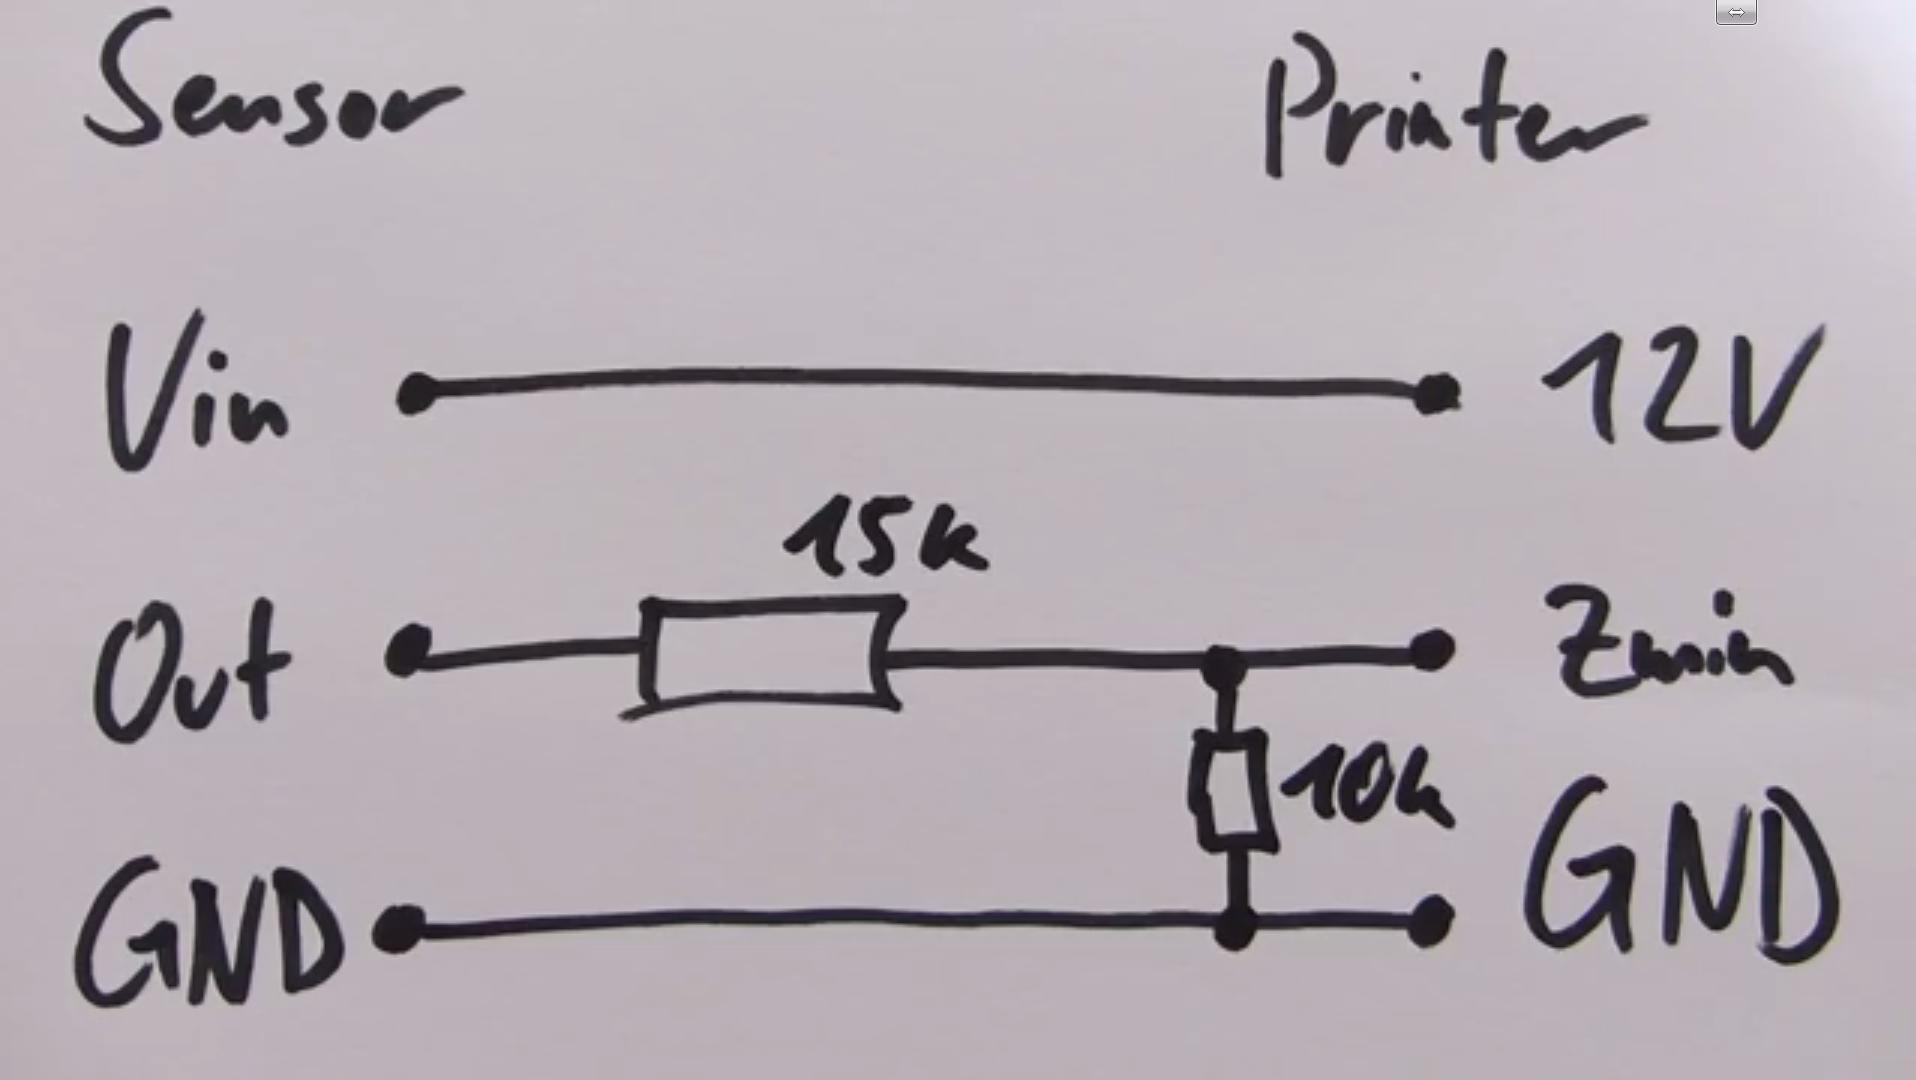 inductive sensor wiring ramps 1 4 electrical wiring diagrams npn proximity switch wiring diagram best capacitive proximity sensor for glass sheet on pcb heater? prox switch wiring diagram inductive sensor wiring ramps 1 4